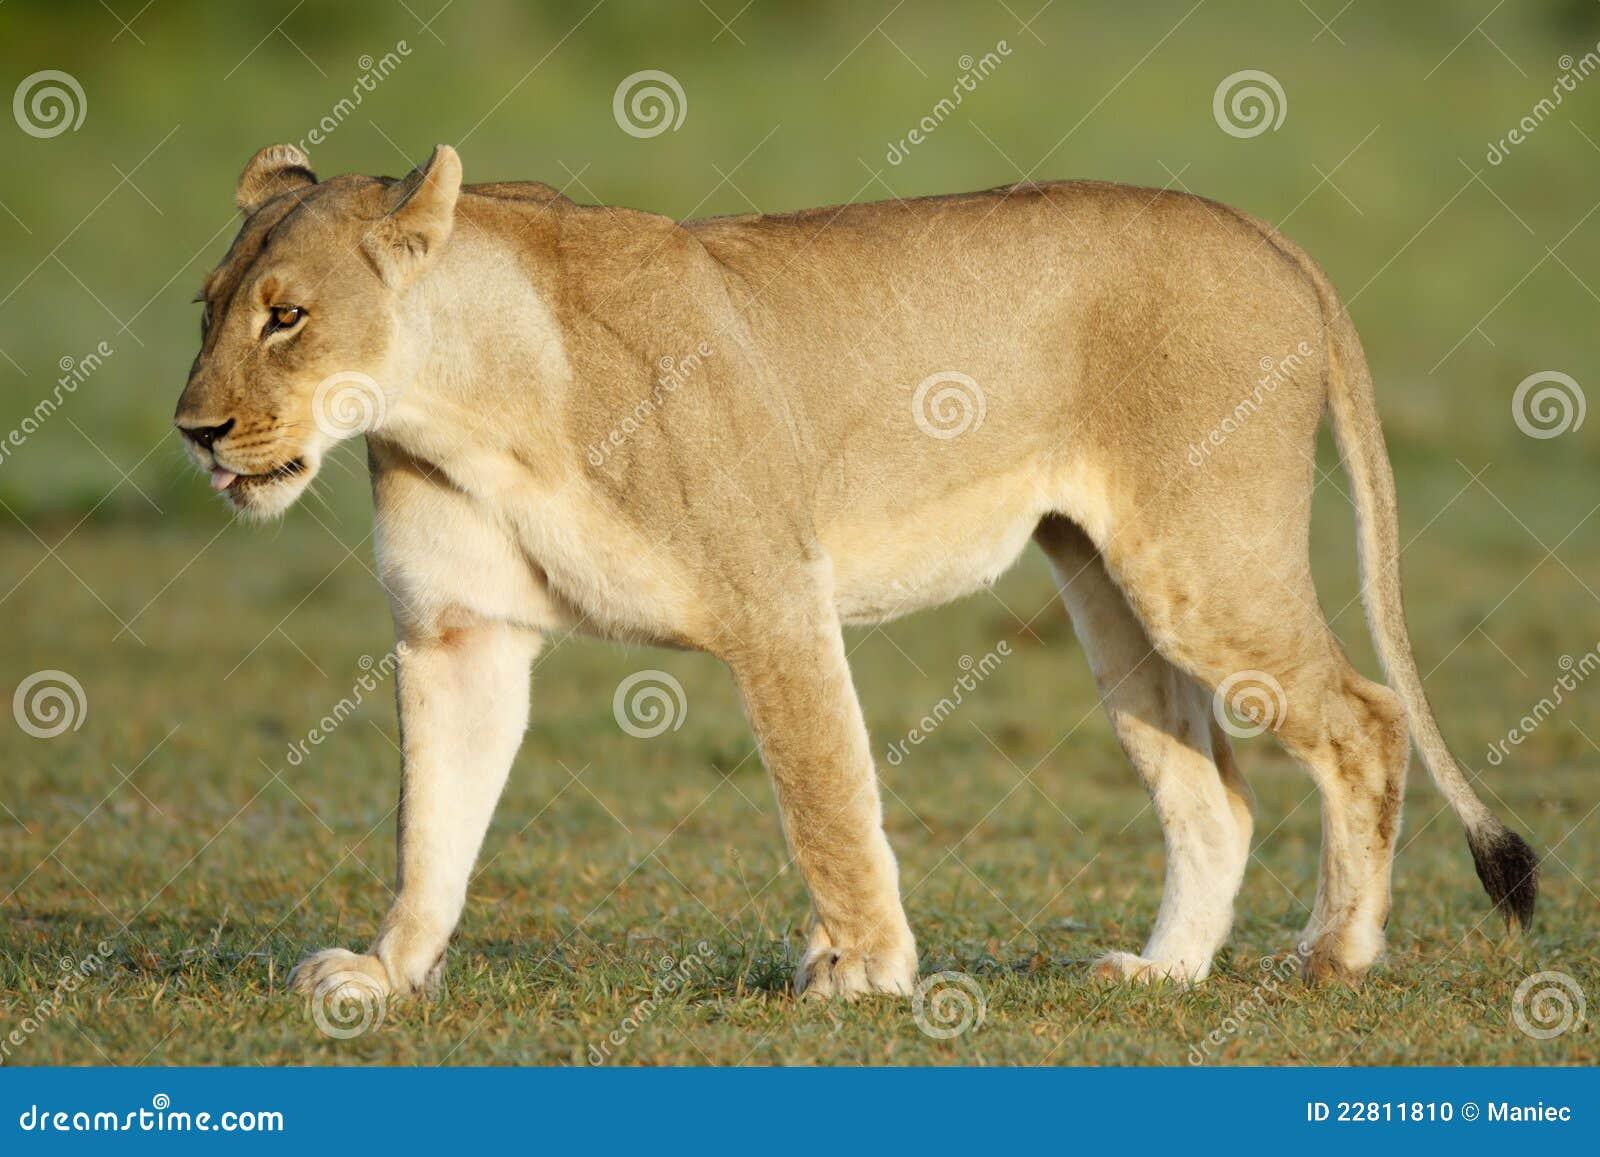 lioness strolling on Nxai Pan, Botswana.